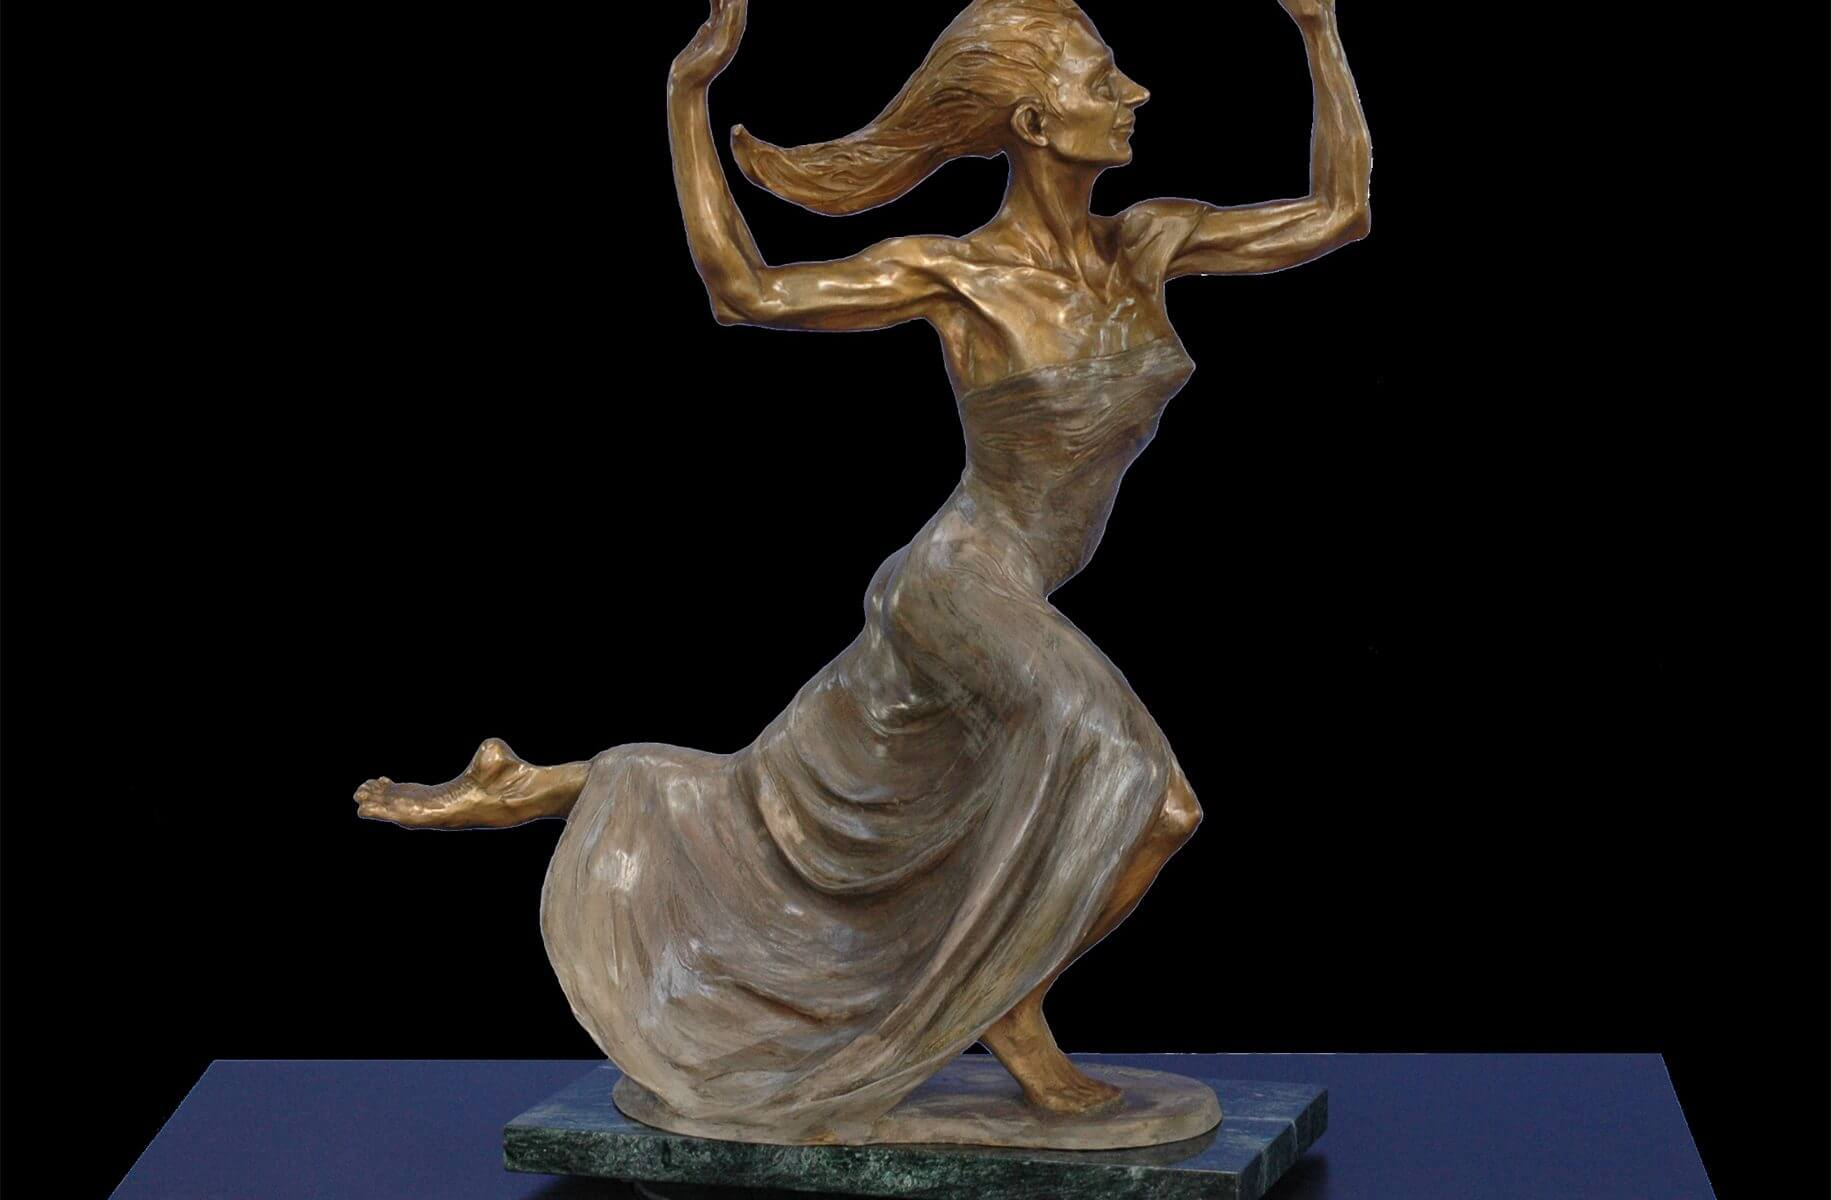 Amazing Grace a medium size bronze dancer by sculptor Andrew DeVries